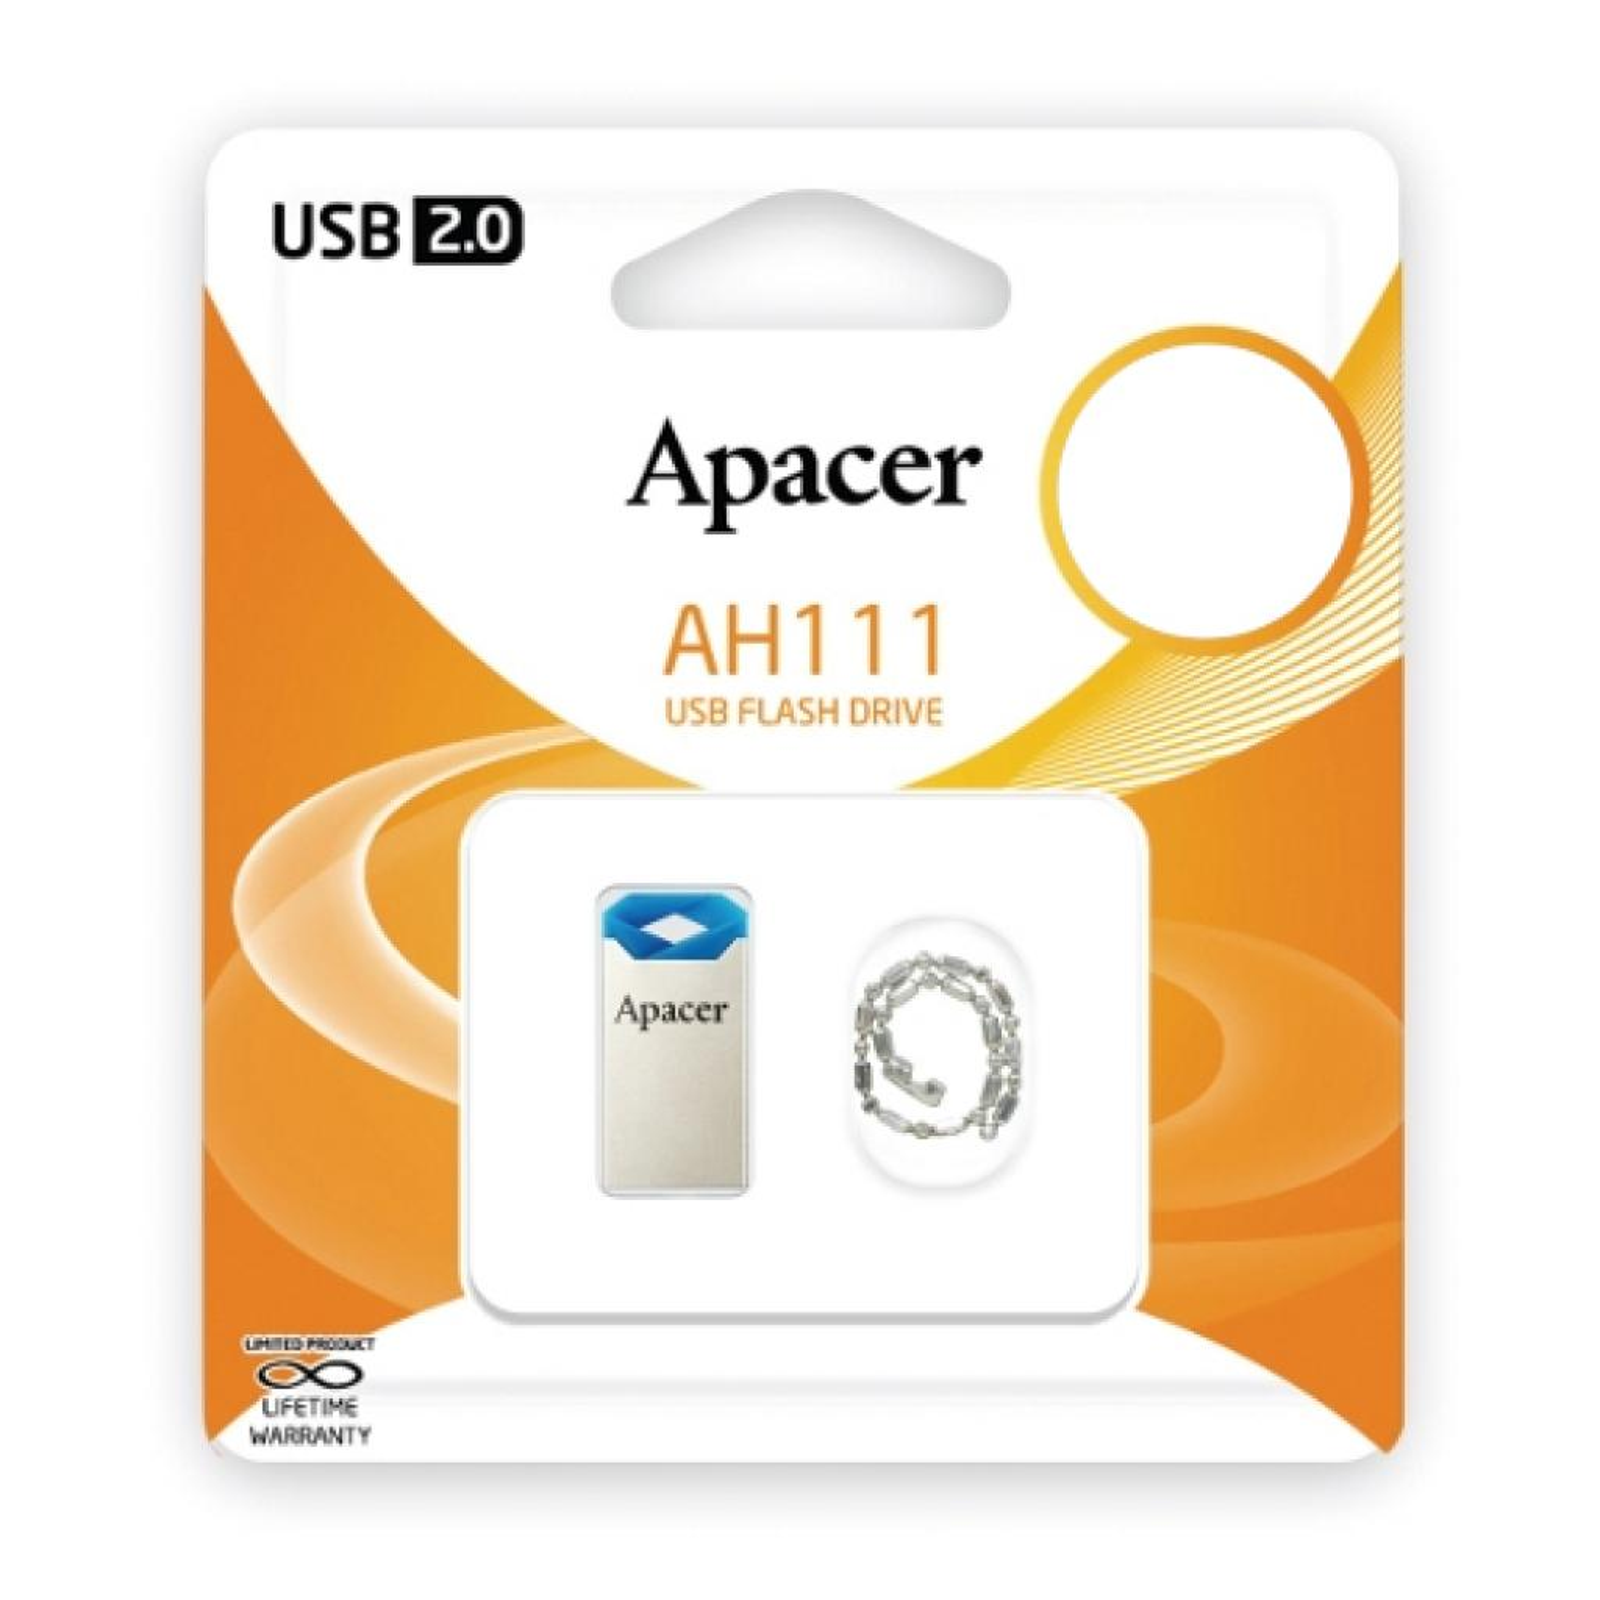 USB флеш накопитель 32GB AH111 Blue RP USB2.0 Apacer (AP32GAH111U-1) изображение 5